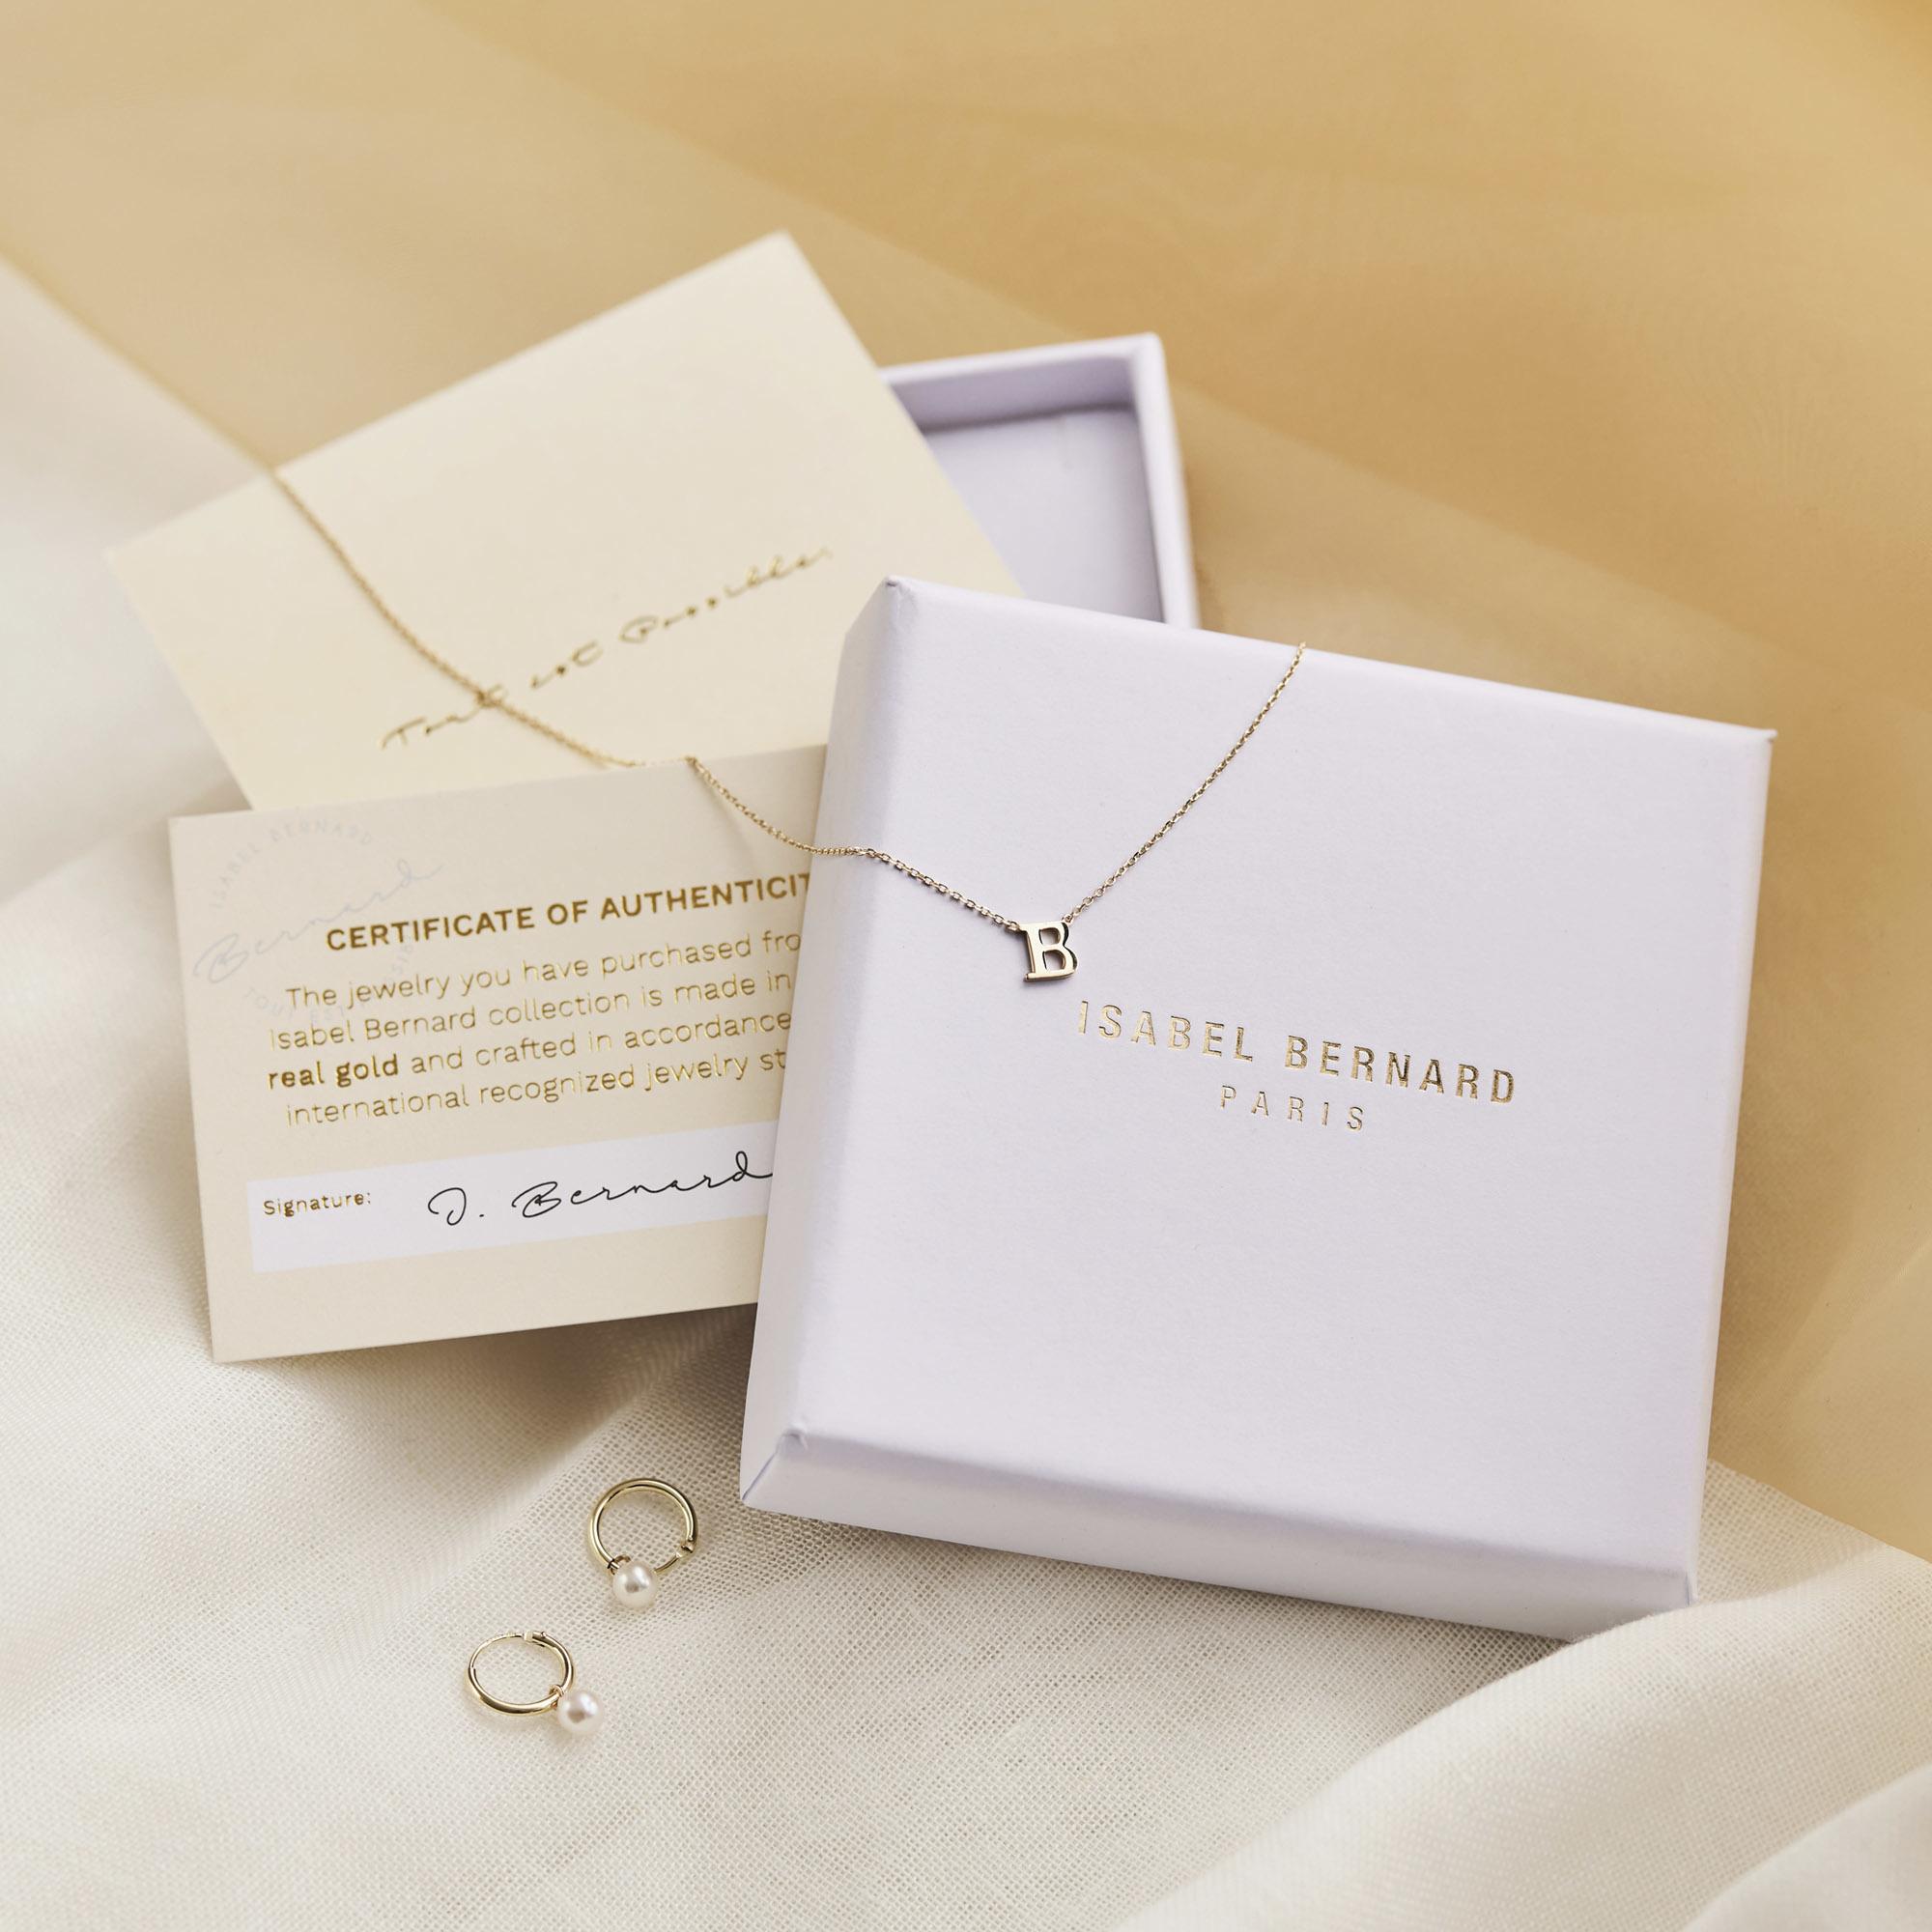 Isabel Bernard Saint Germain de Buci anello in oro bianco 14 carati